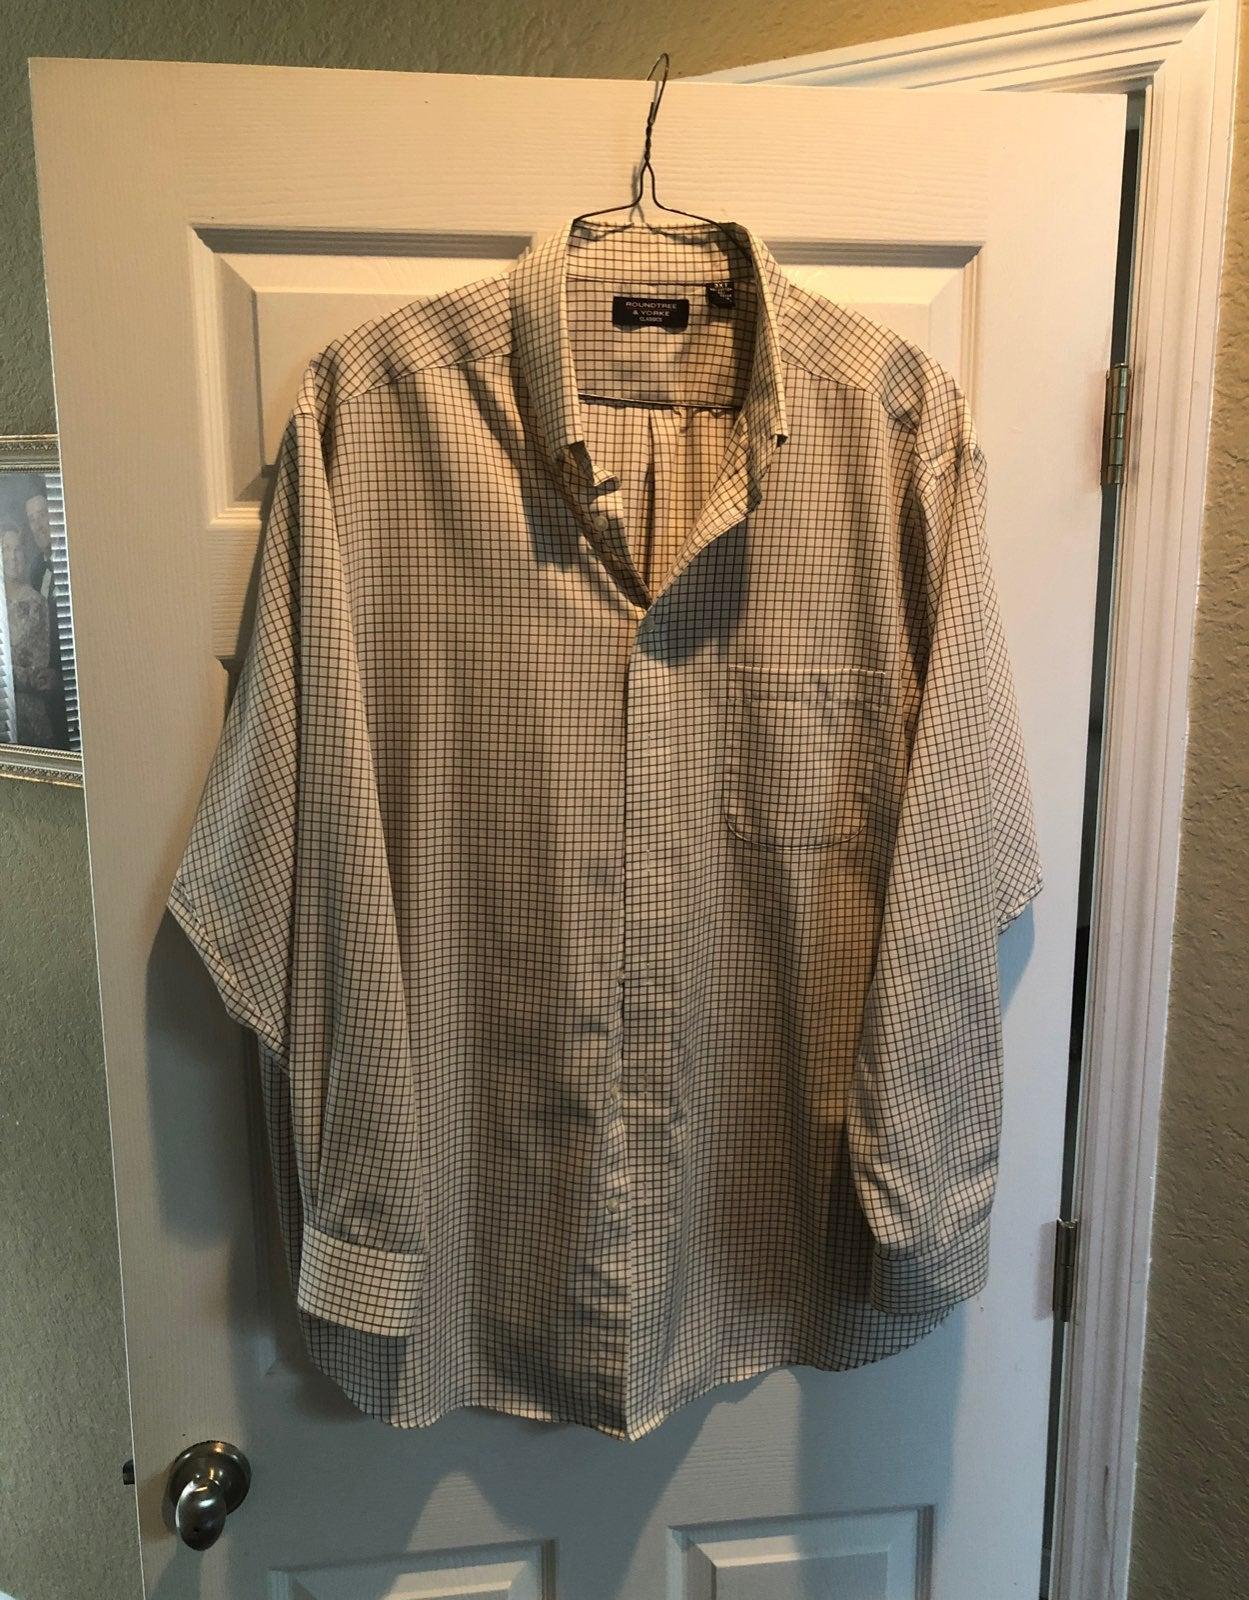 Roundtree and York Dress shirt